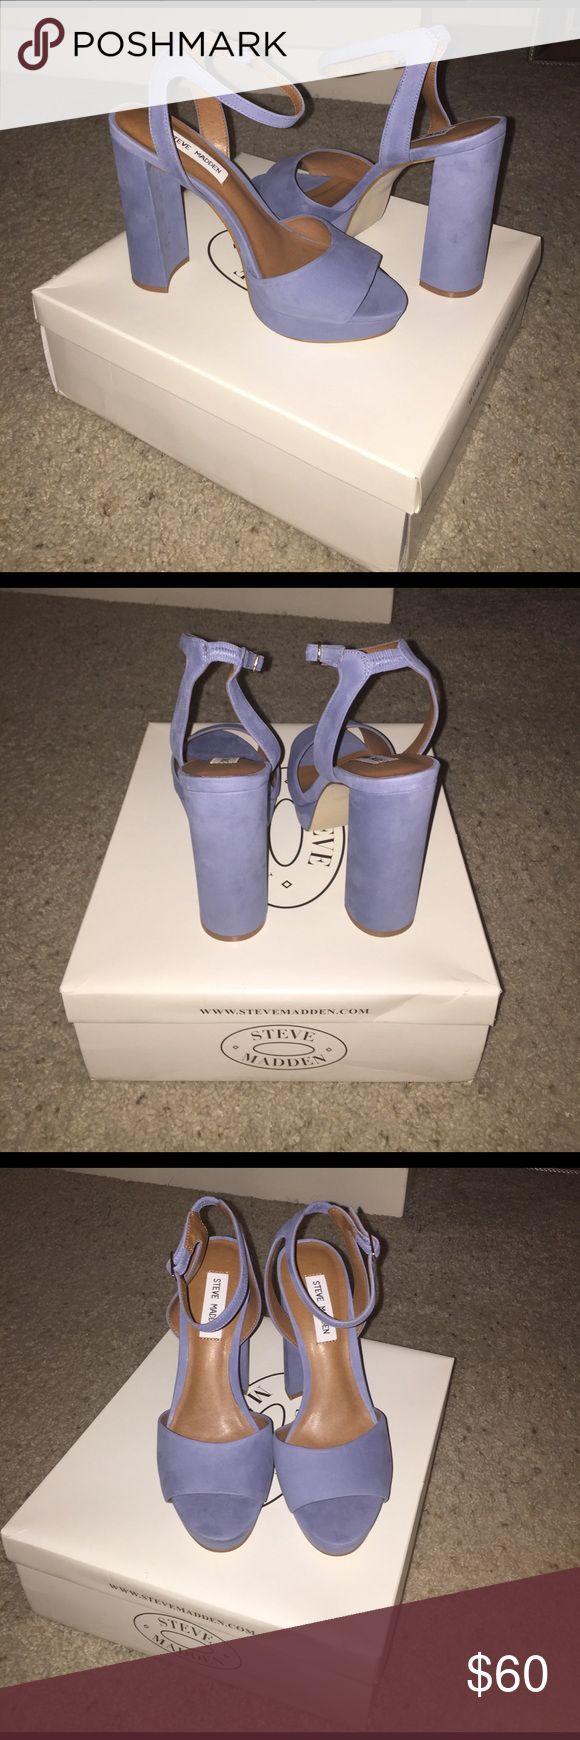 NEW Steve Madden Platform Sandals BRAND NEW Never worn Steve Madden Platform Sandals in Light Blue. Size 8. **Serious Offers Only** Steve Madden Shoes Sandals